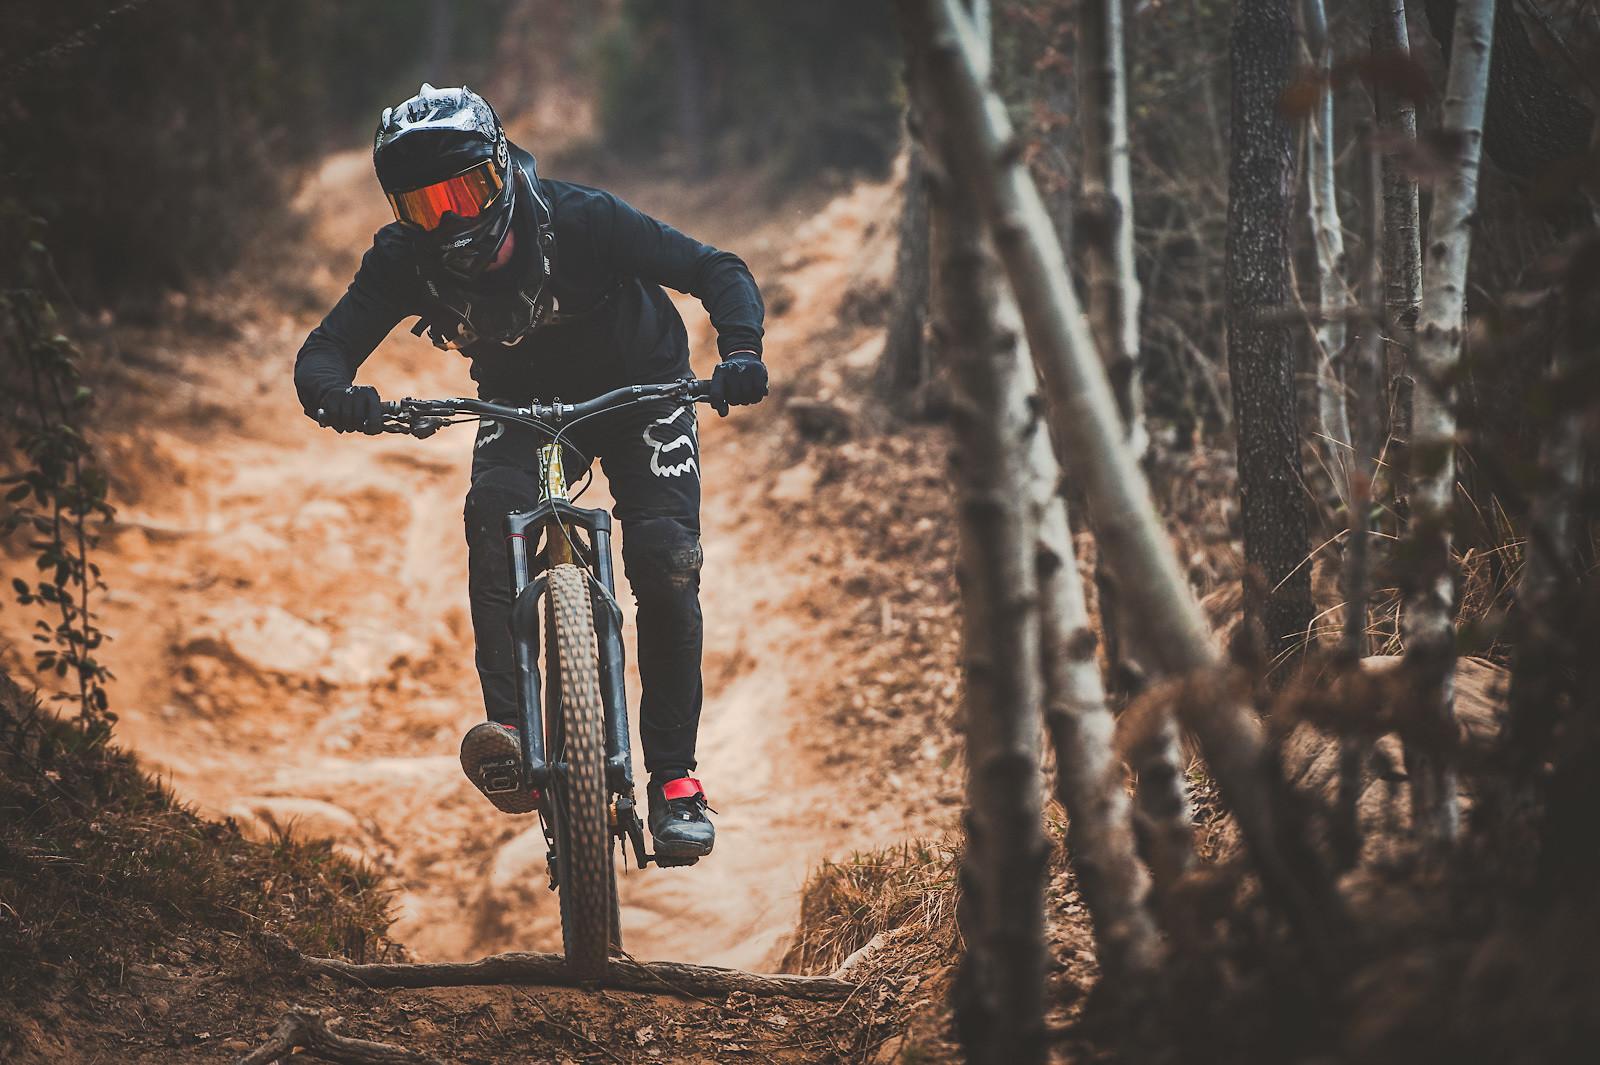 italy - Banan - Mountain Biking Pictures - Vital MTB